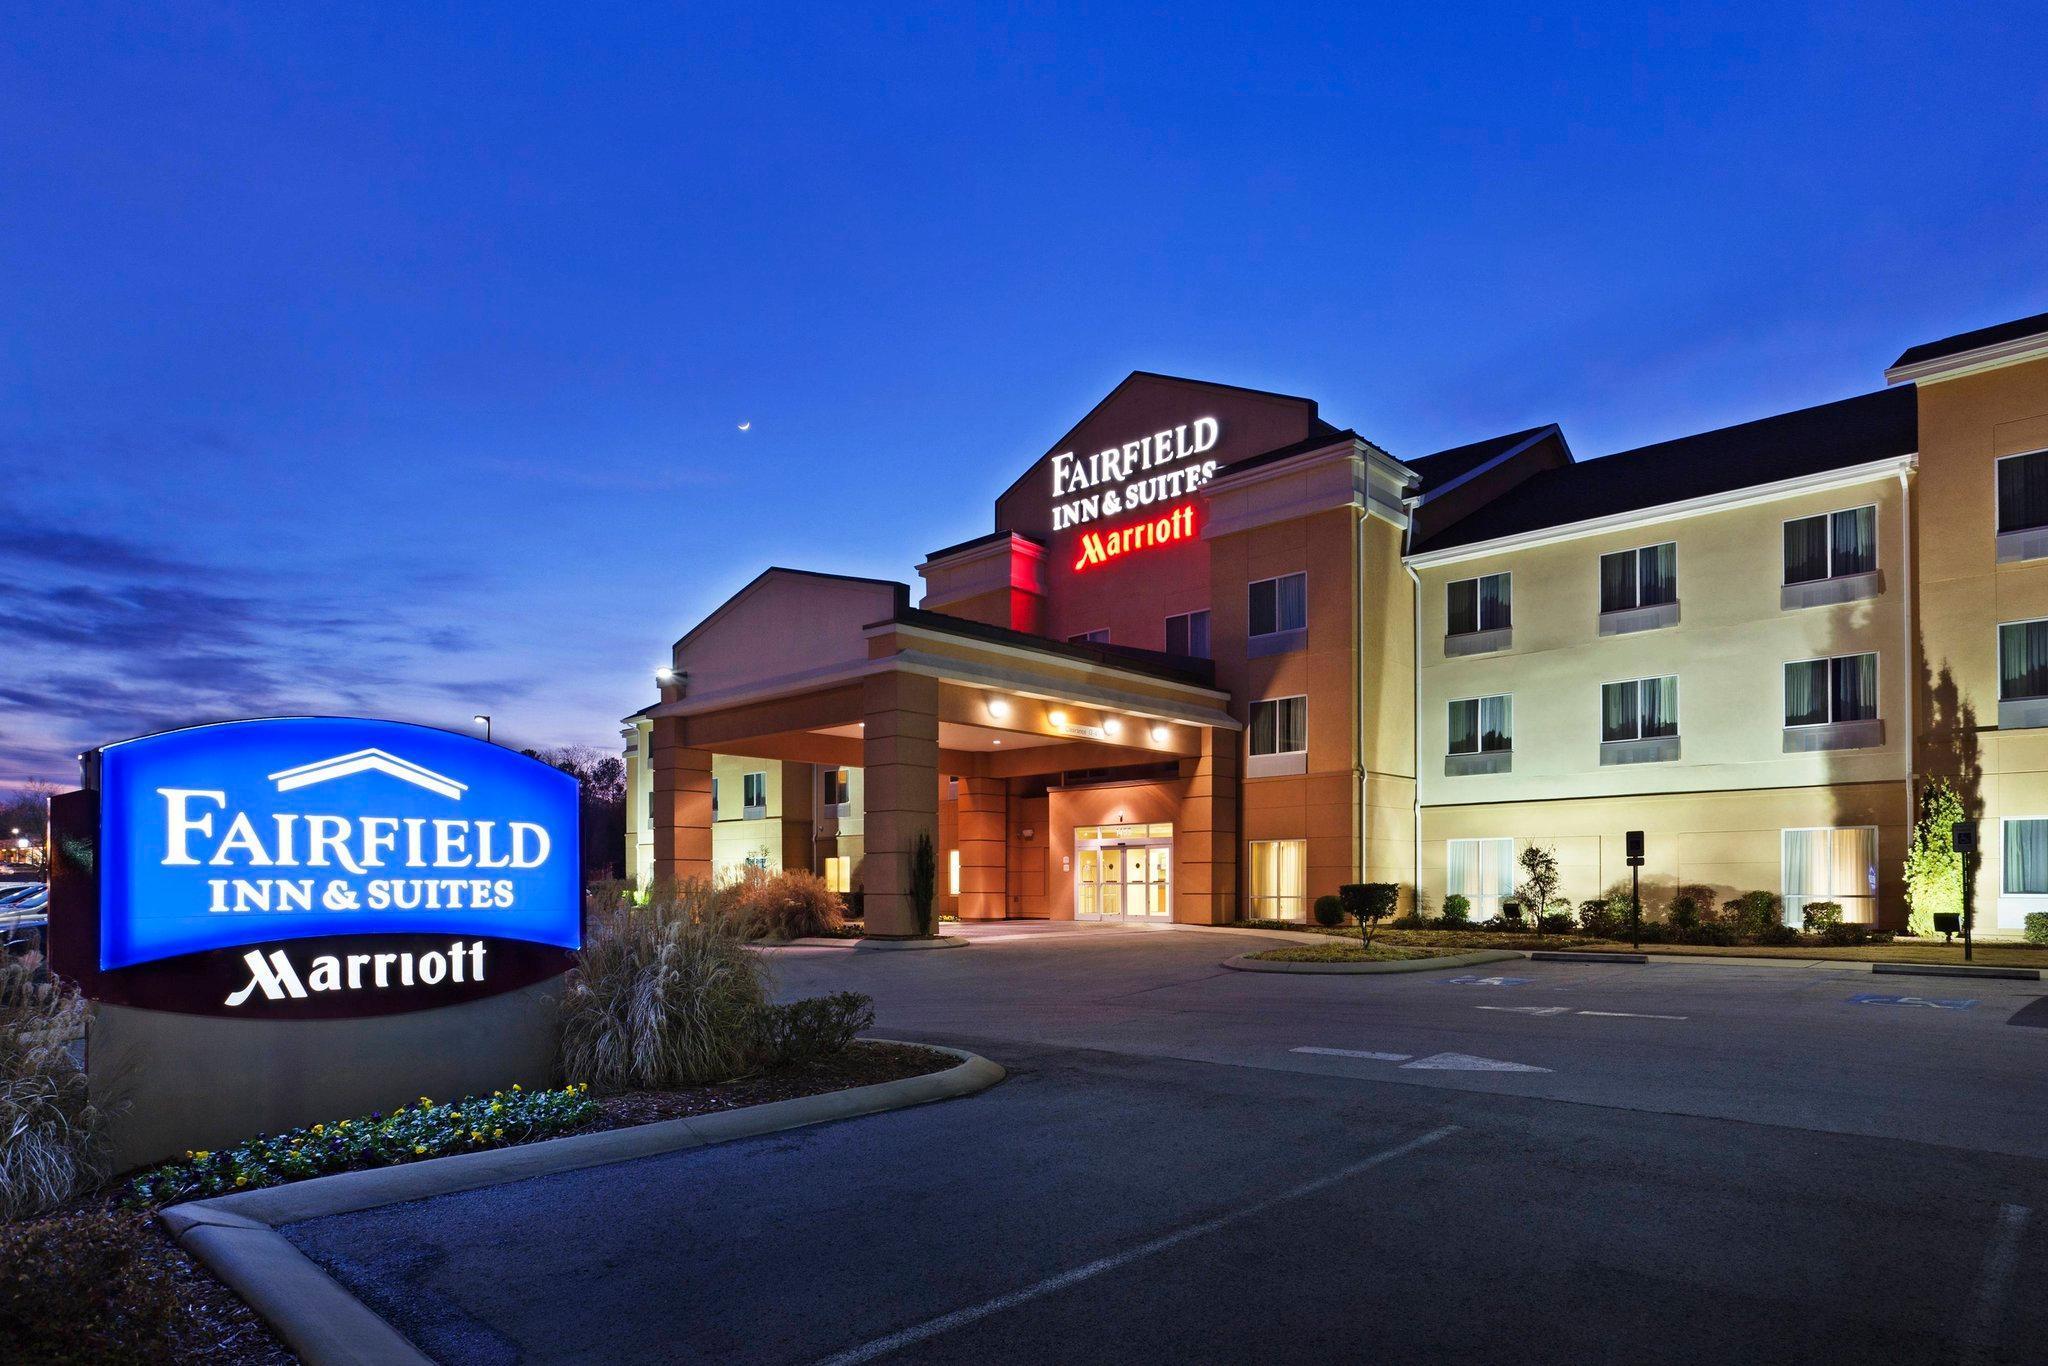 Book Fairfield Inn Suites Chattanooga South East Ridge In